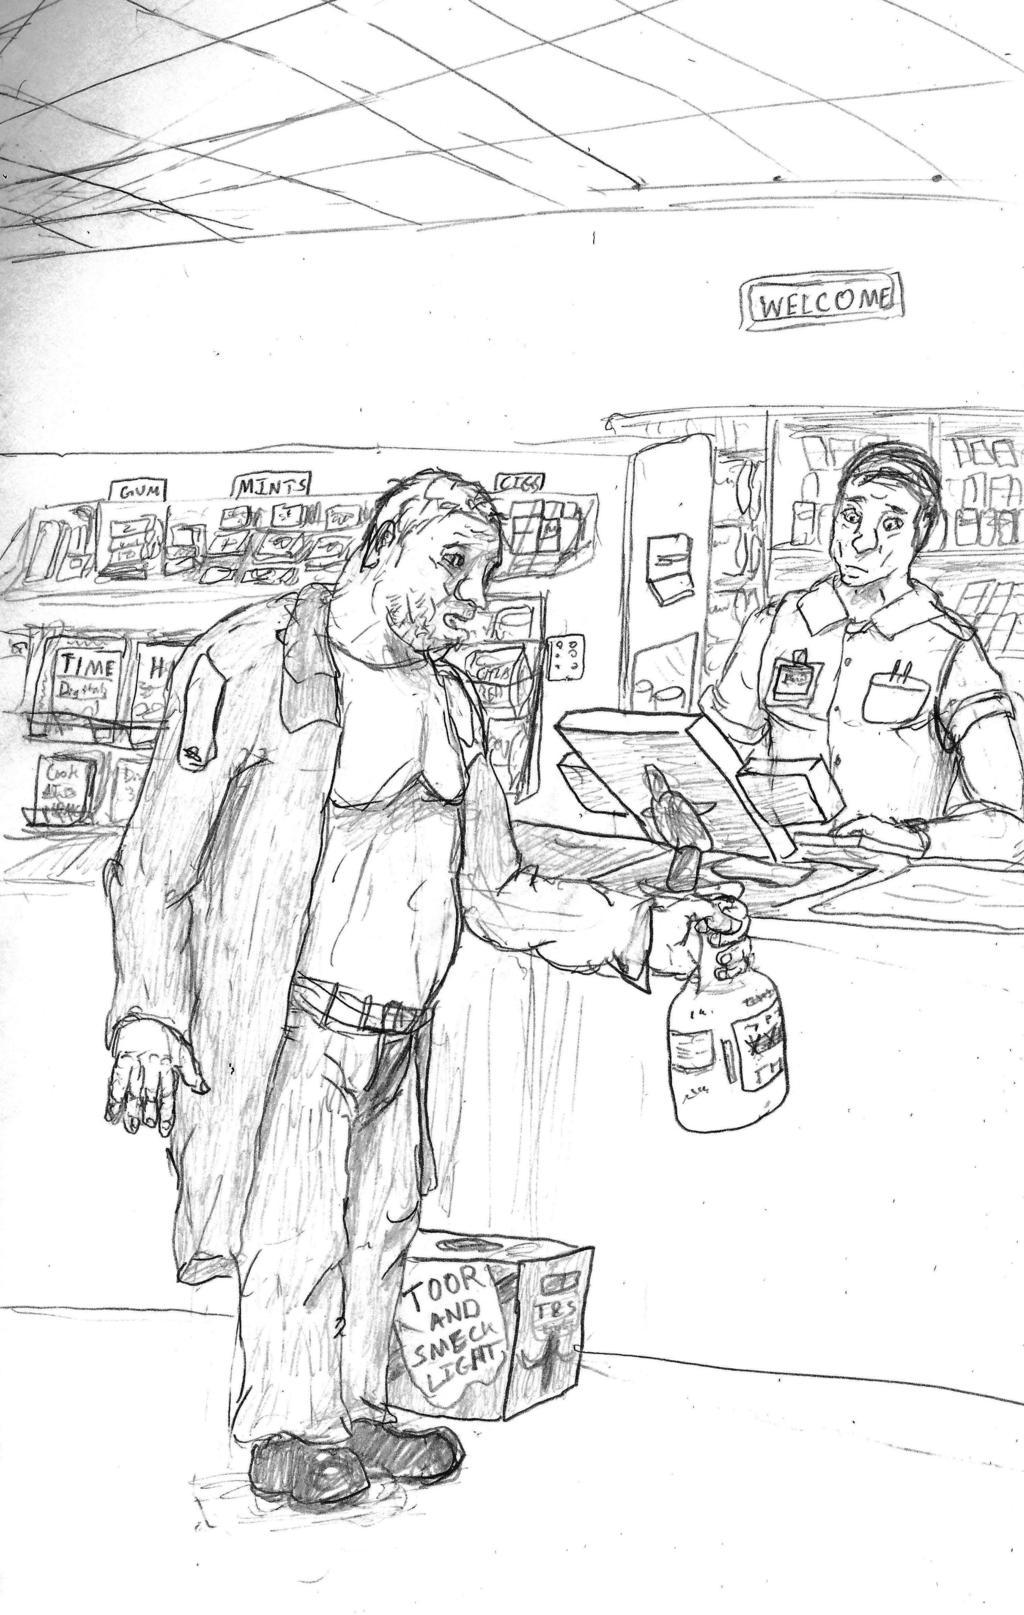 Liquor in the Store